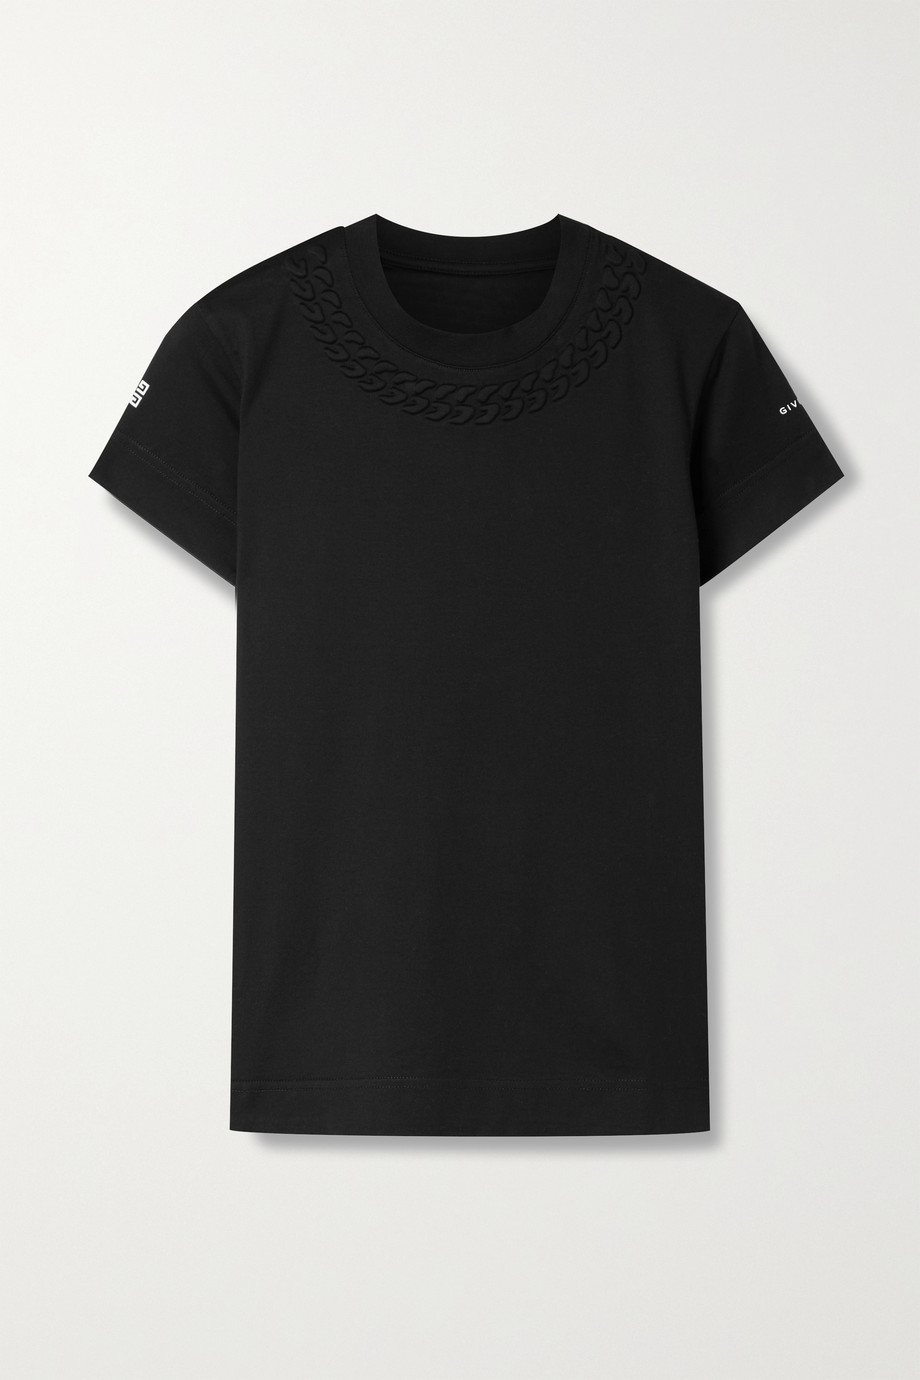 Givenchy T-shirt en jersey de coton gaufré